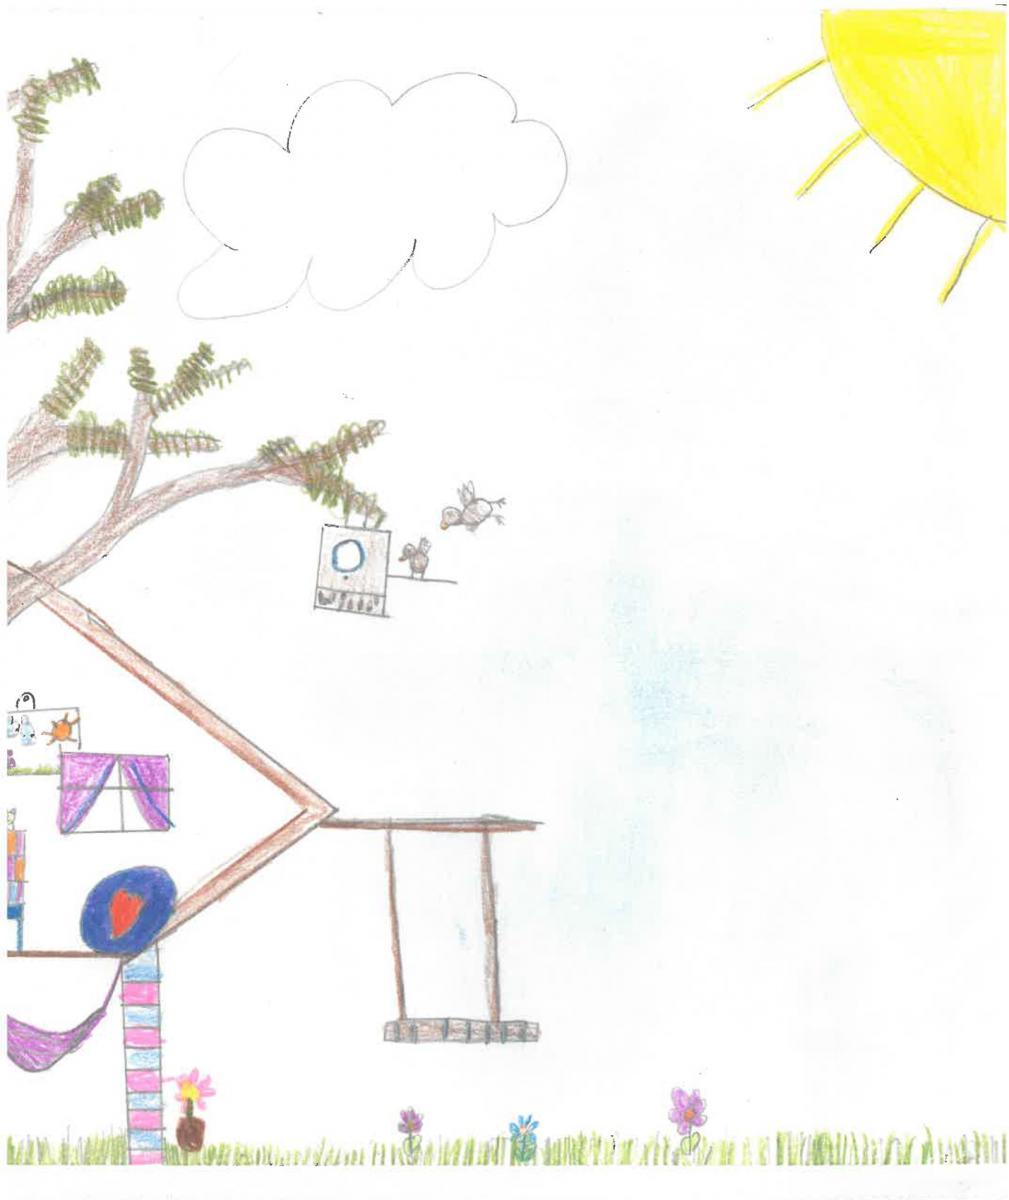 Hanna, Dürnkrut, 10 Jahre